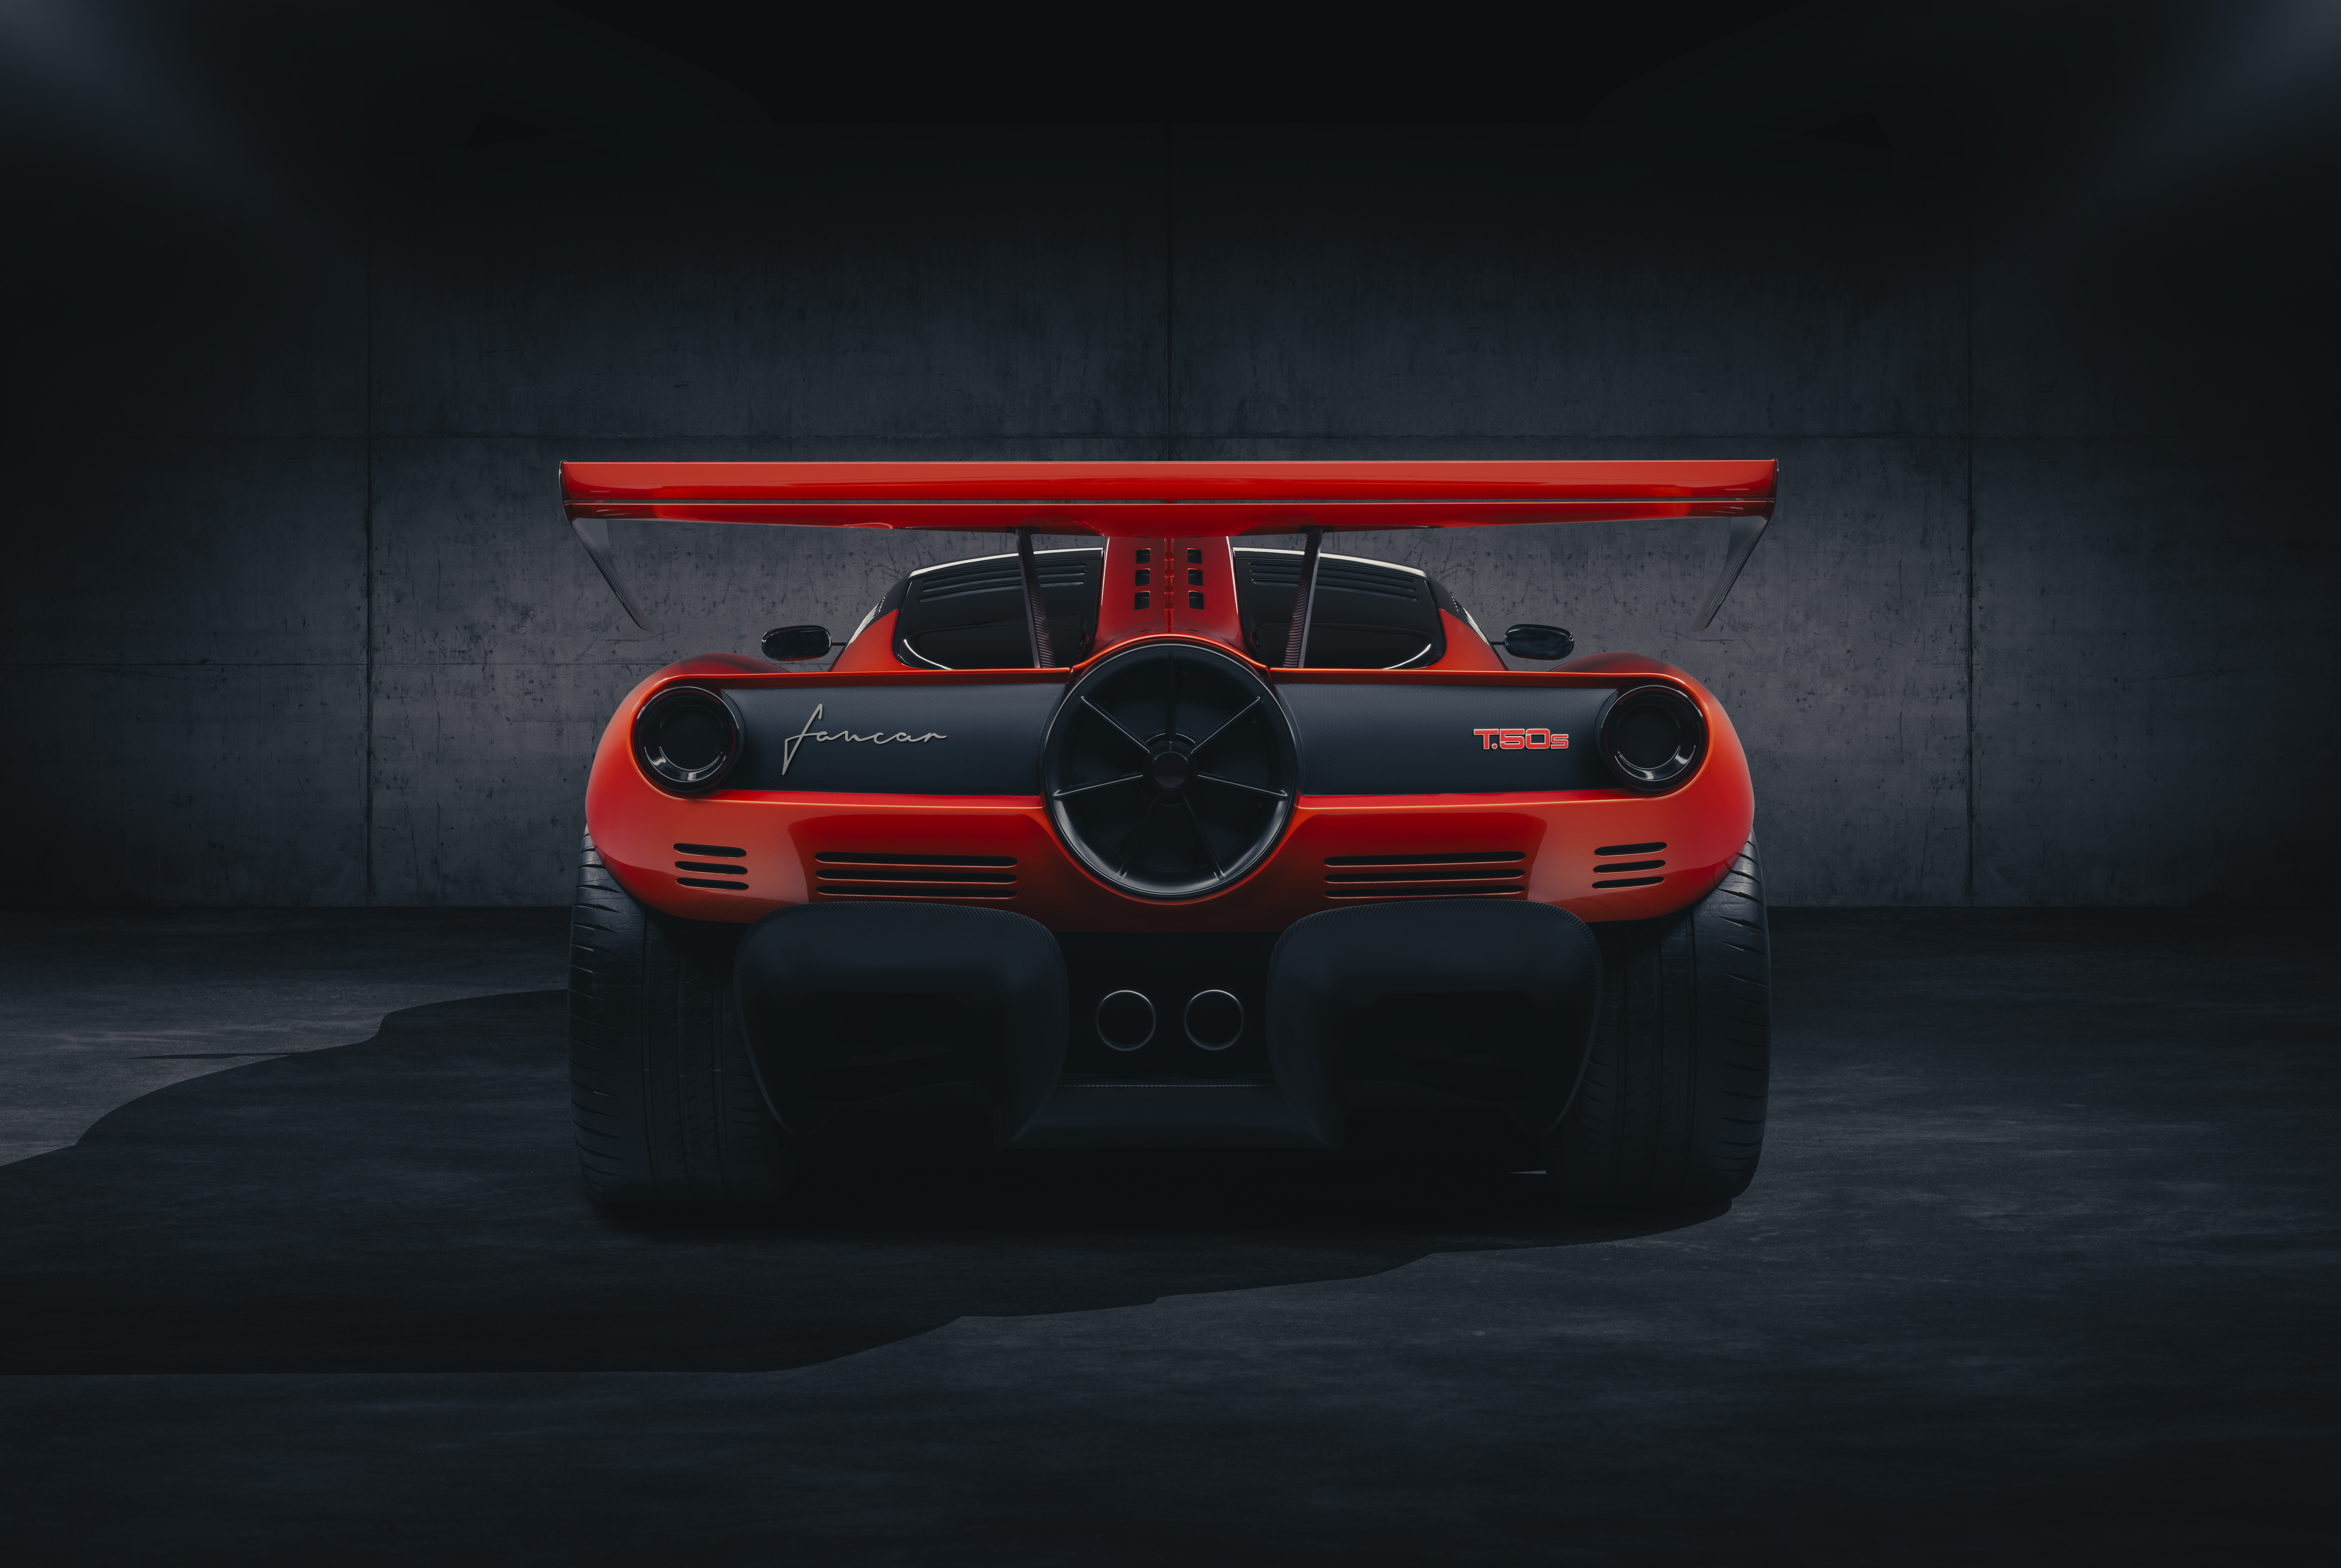 gordon murray automotive t50s niki lauda 2021 4k 1618919750 - Gordon Murray Automotive T50s Niki Lauda 2021 4k - Gordon Murray Automotive T50s Niki Lauda 2021 4k wallpapers